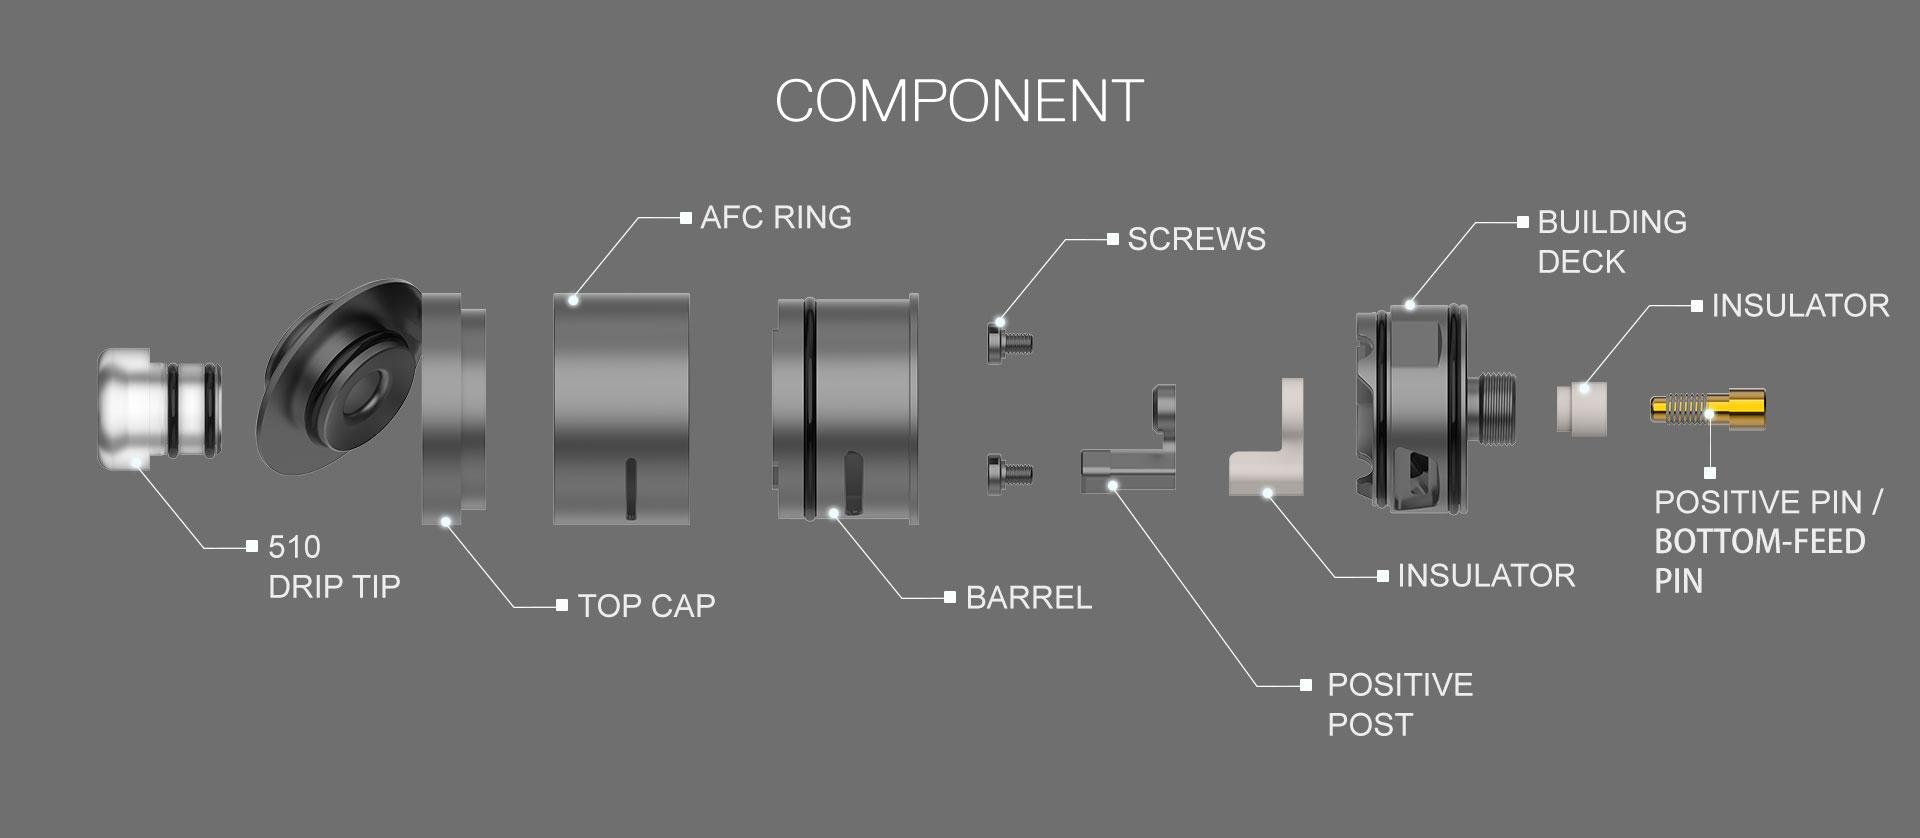 Componentes de Dovpo Bushido V3 RDA: